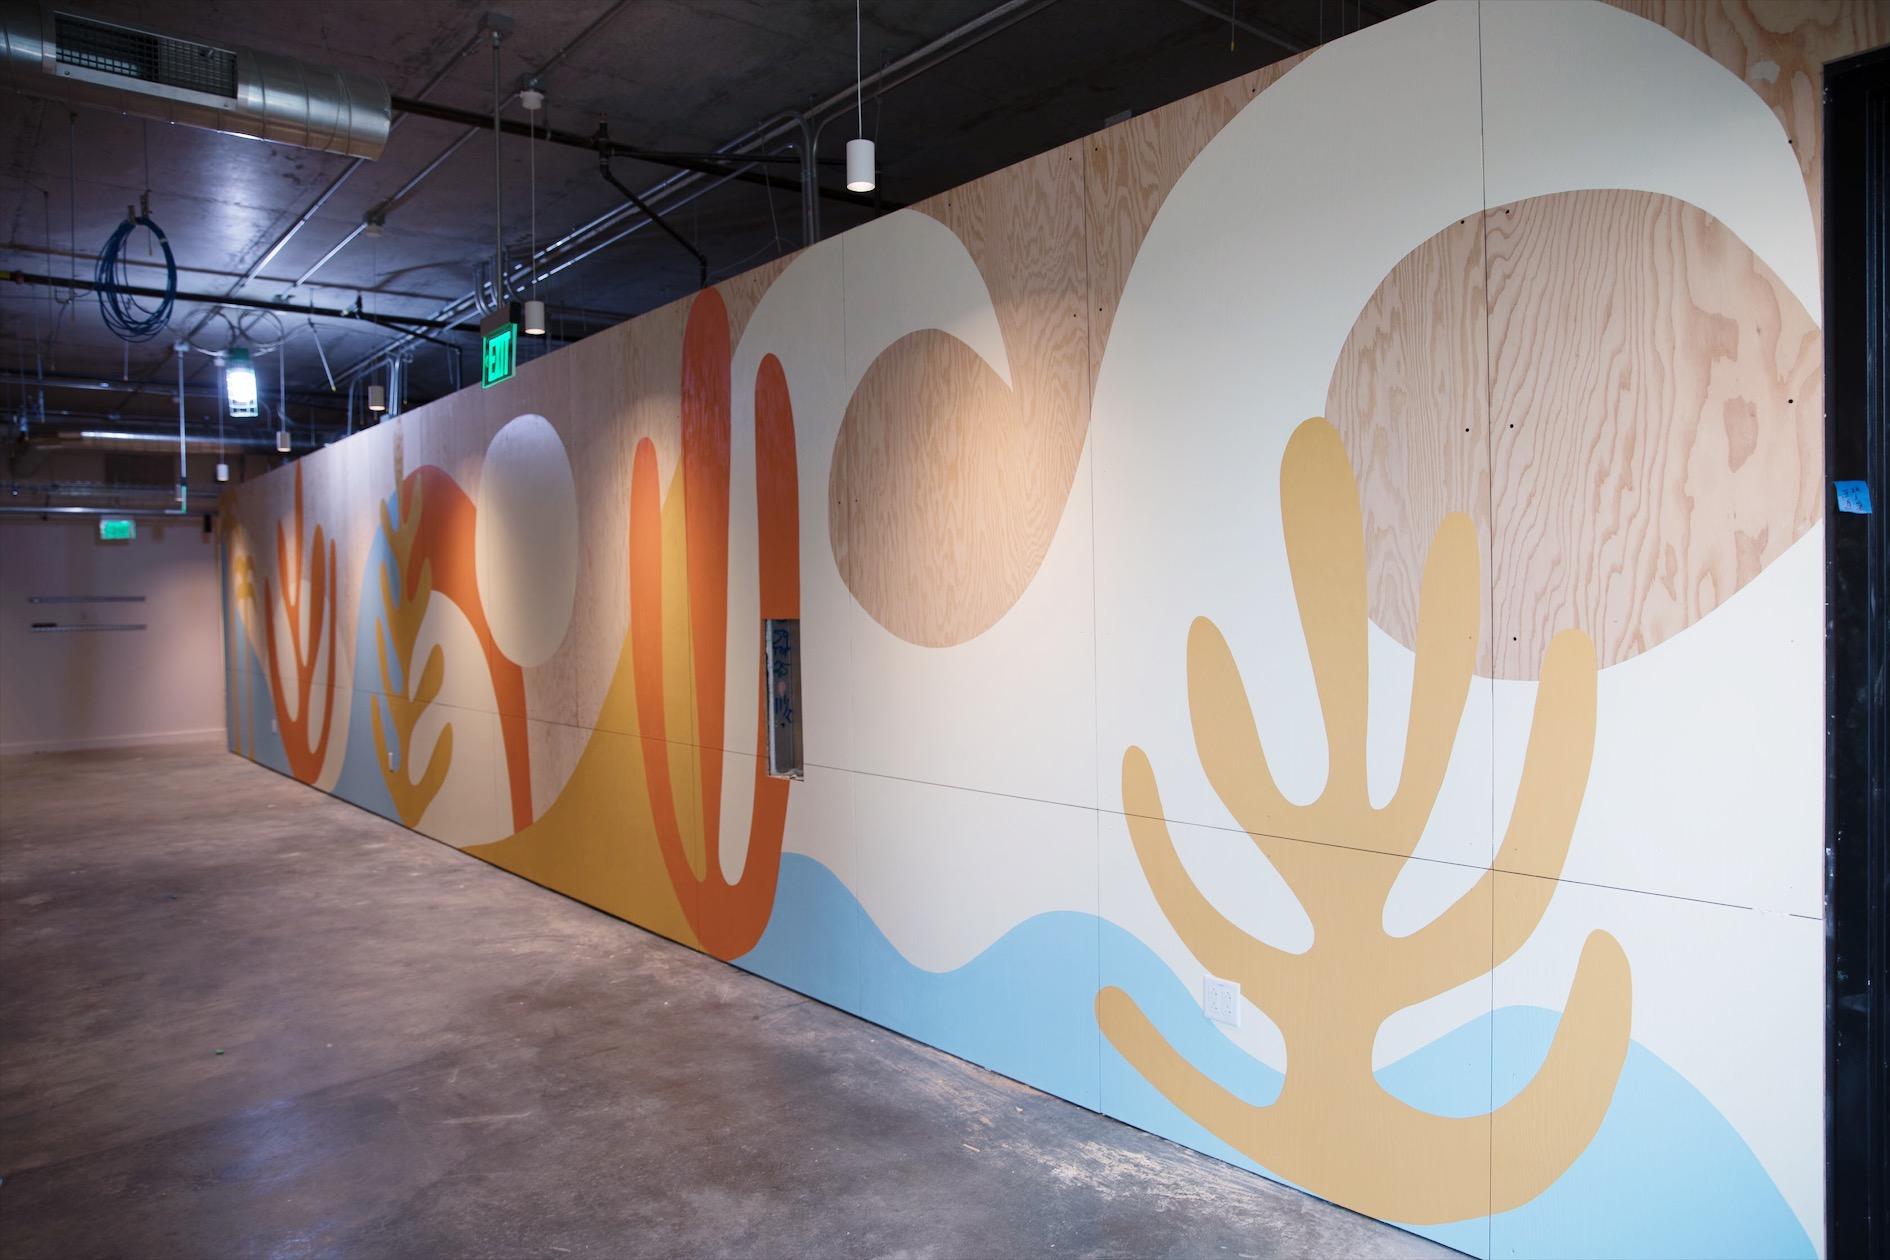 honeyandrust_project_facebook-mural-01_04.jpg